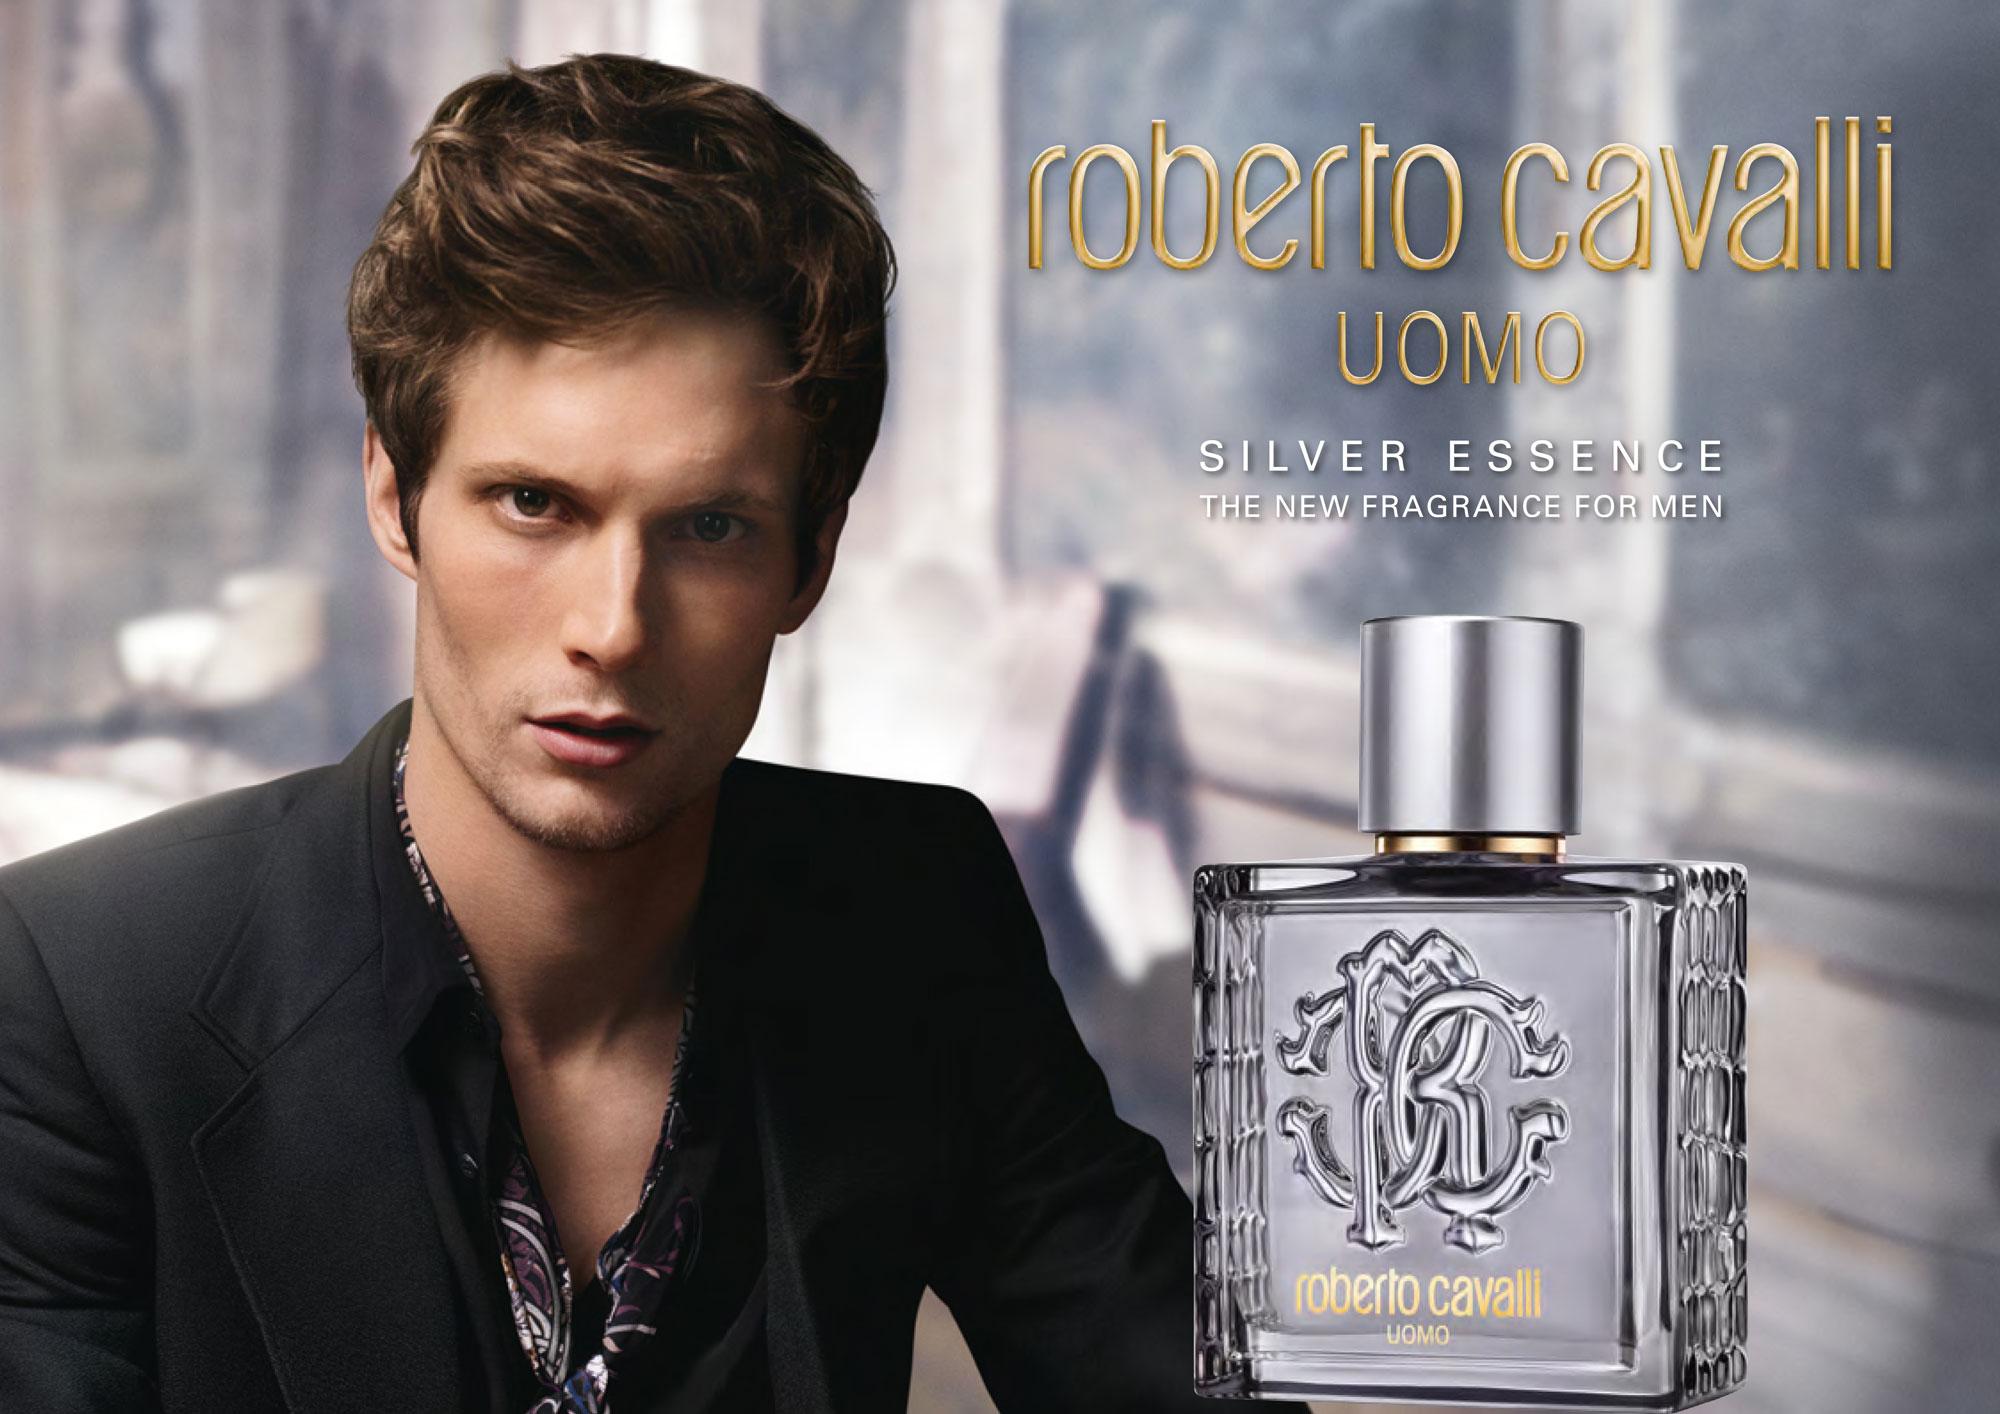 Roberto Cavalli Uomo Silver Essence ad.jpg